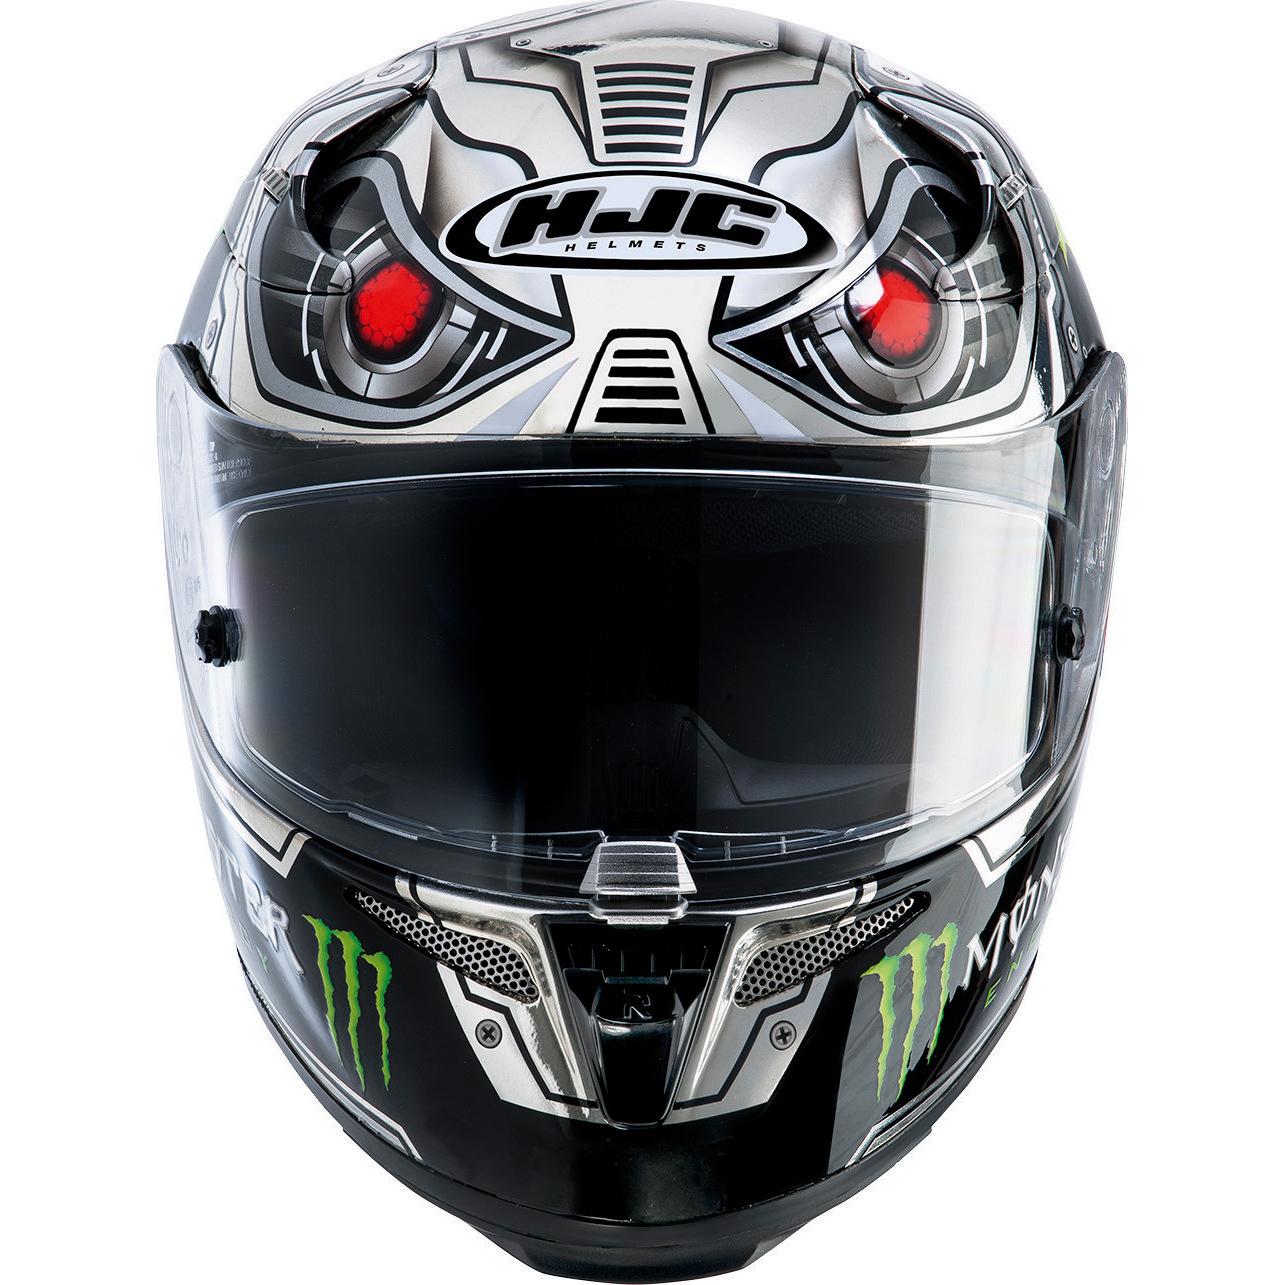 hjc rpha10 plus lorenzo speed machine motorcycle helmet full face race motorbike ebay. Black Bedroom Furniture Sets. Home Design Ideas